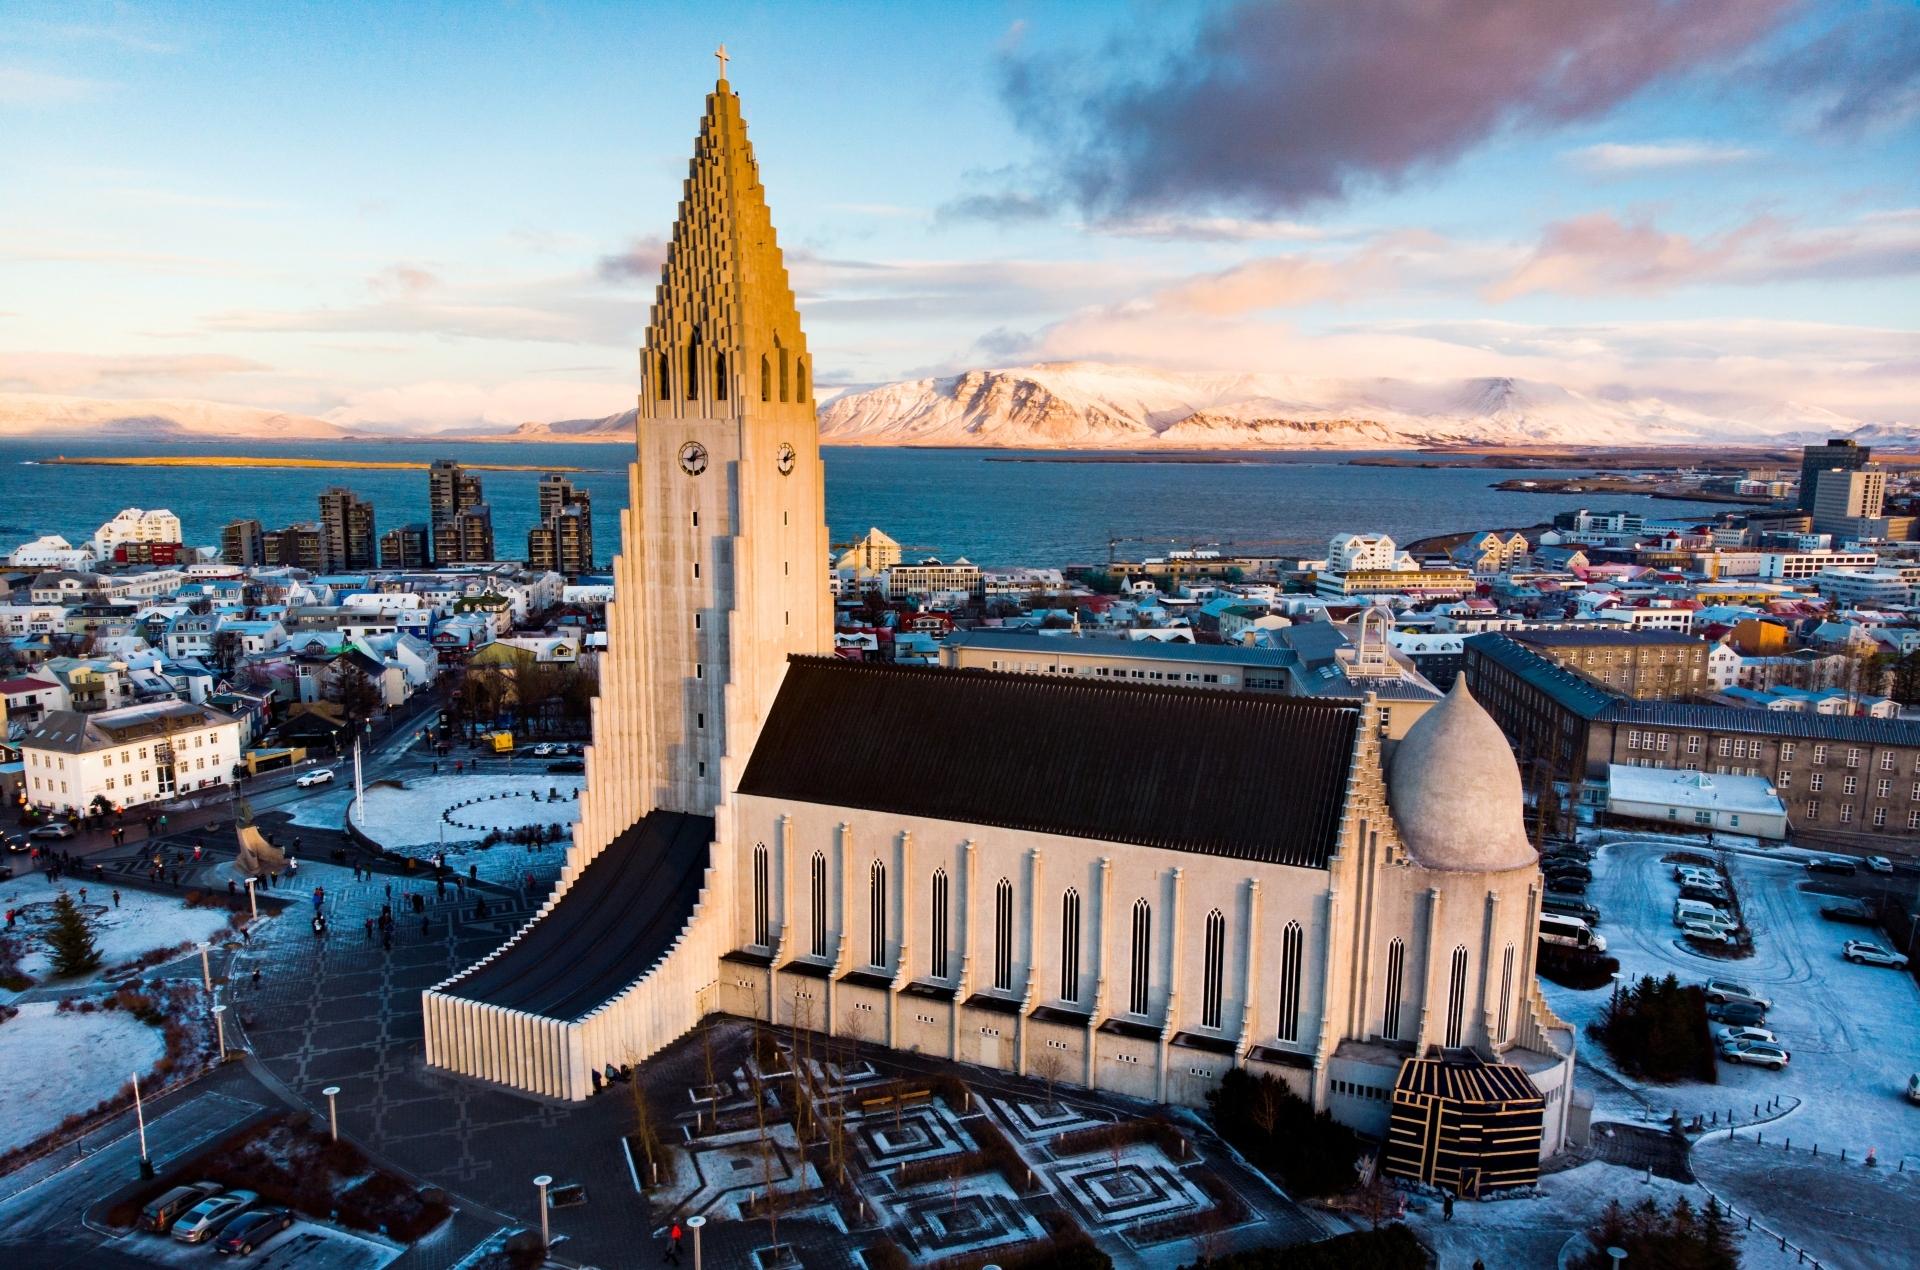 vue aérienne sur l'eglise hallgrimskirkja à Reykjavik